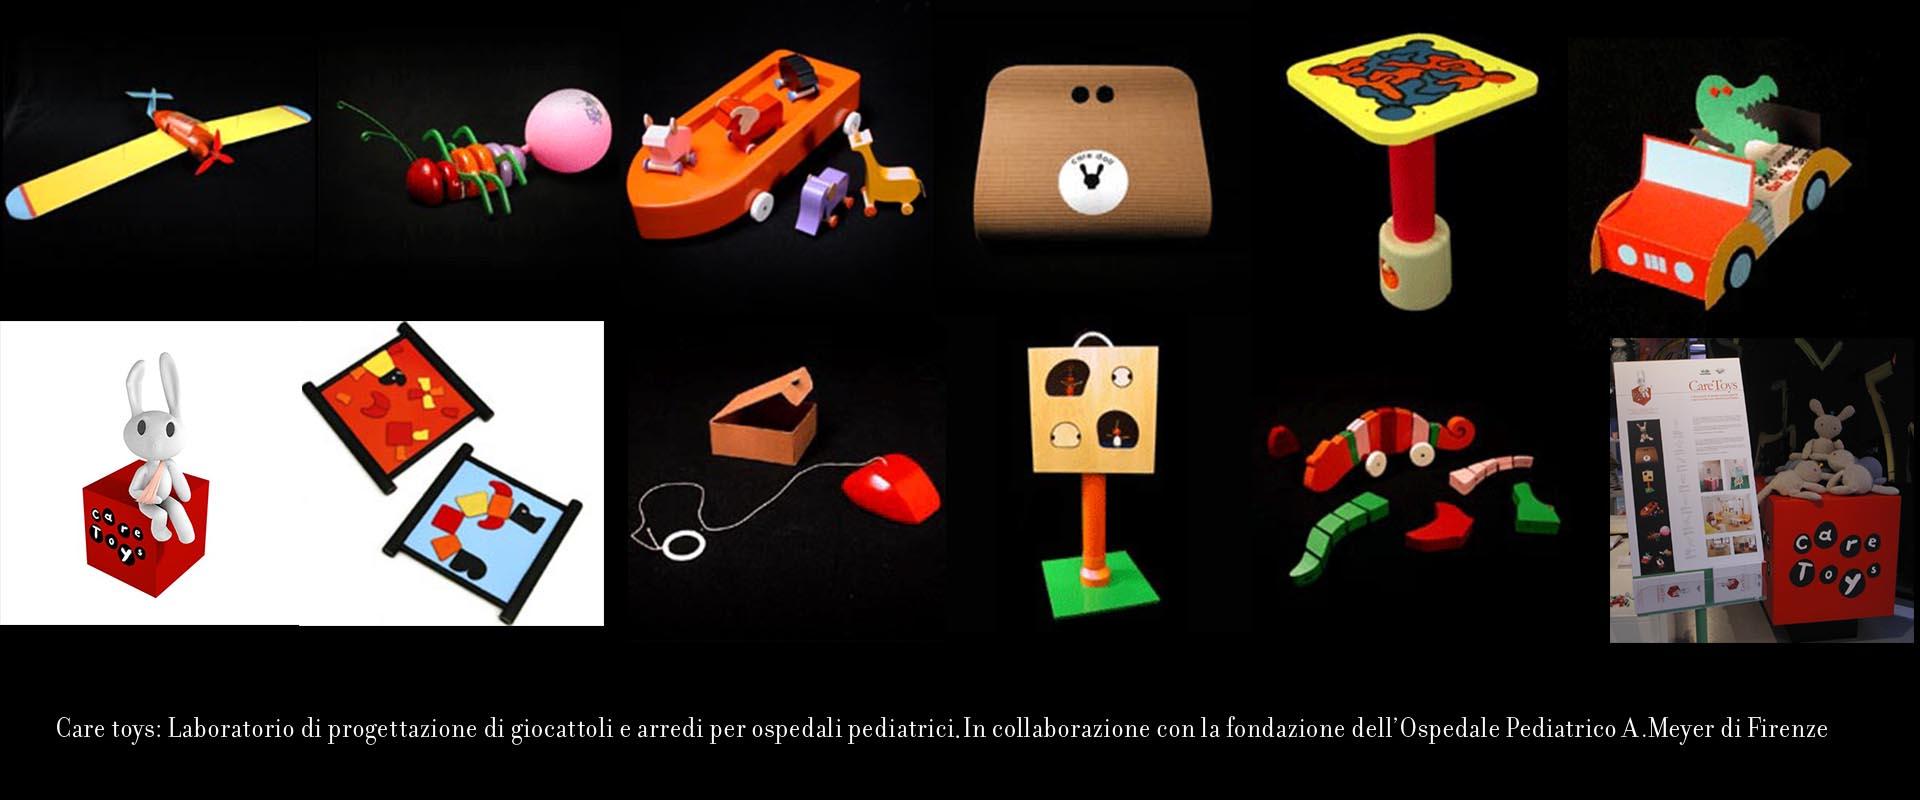 aironic_architettura_design_interior_care_toys